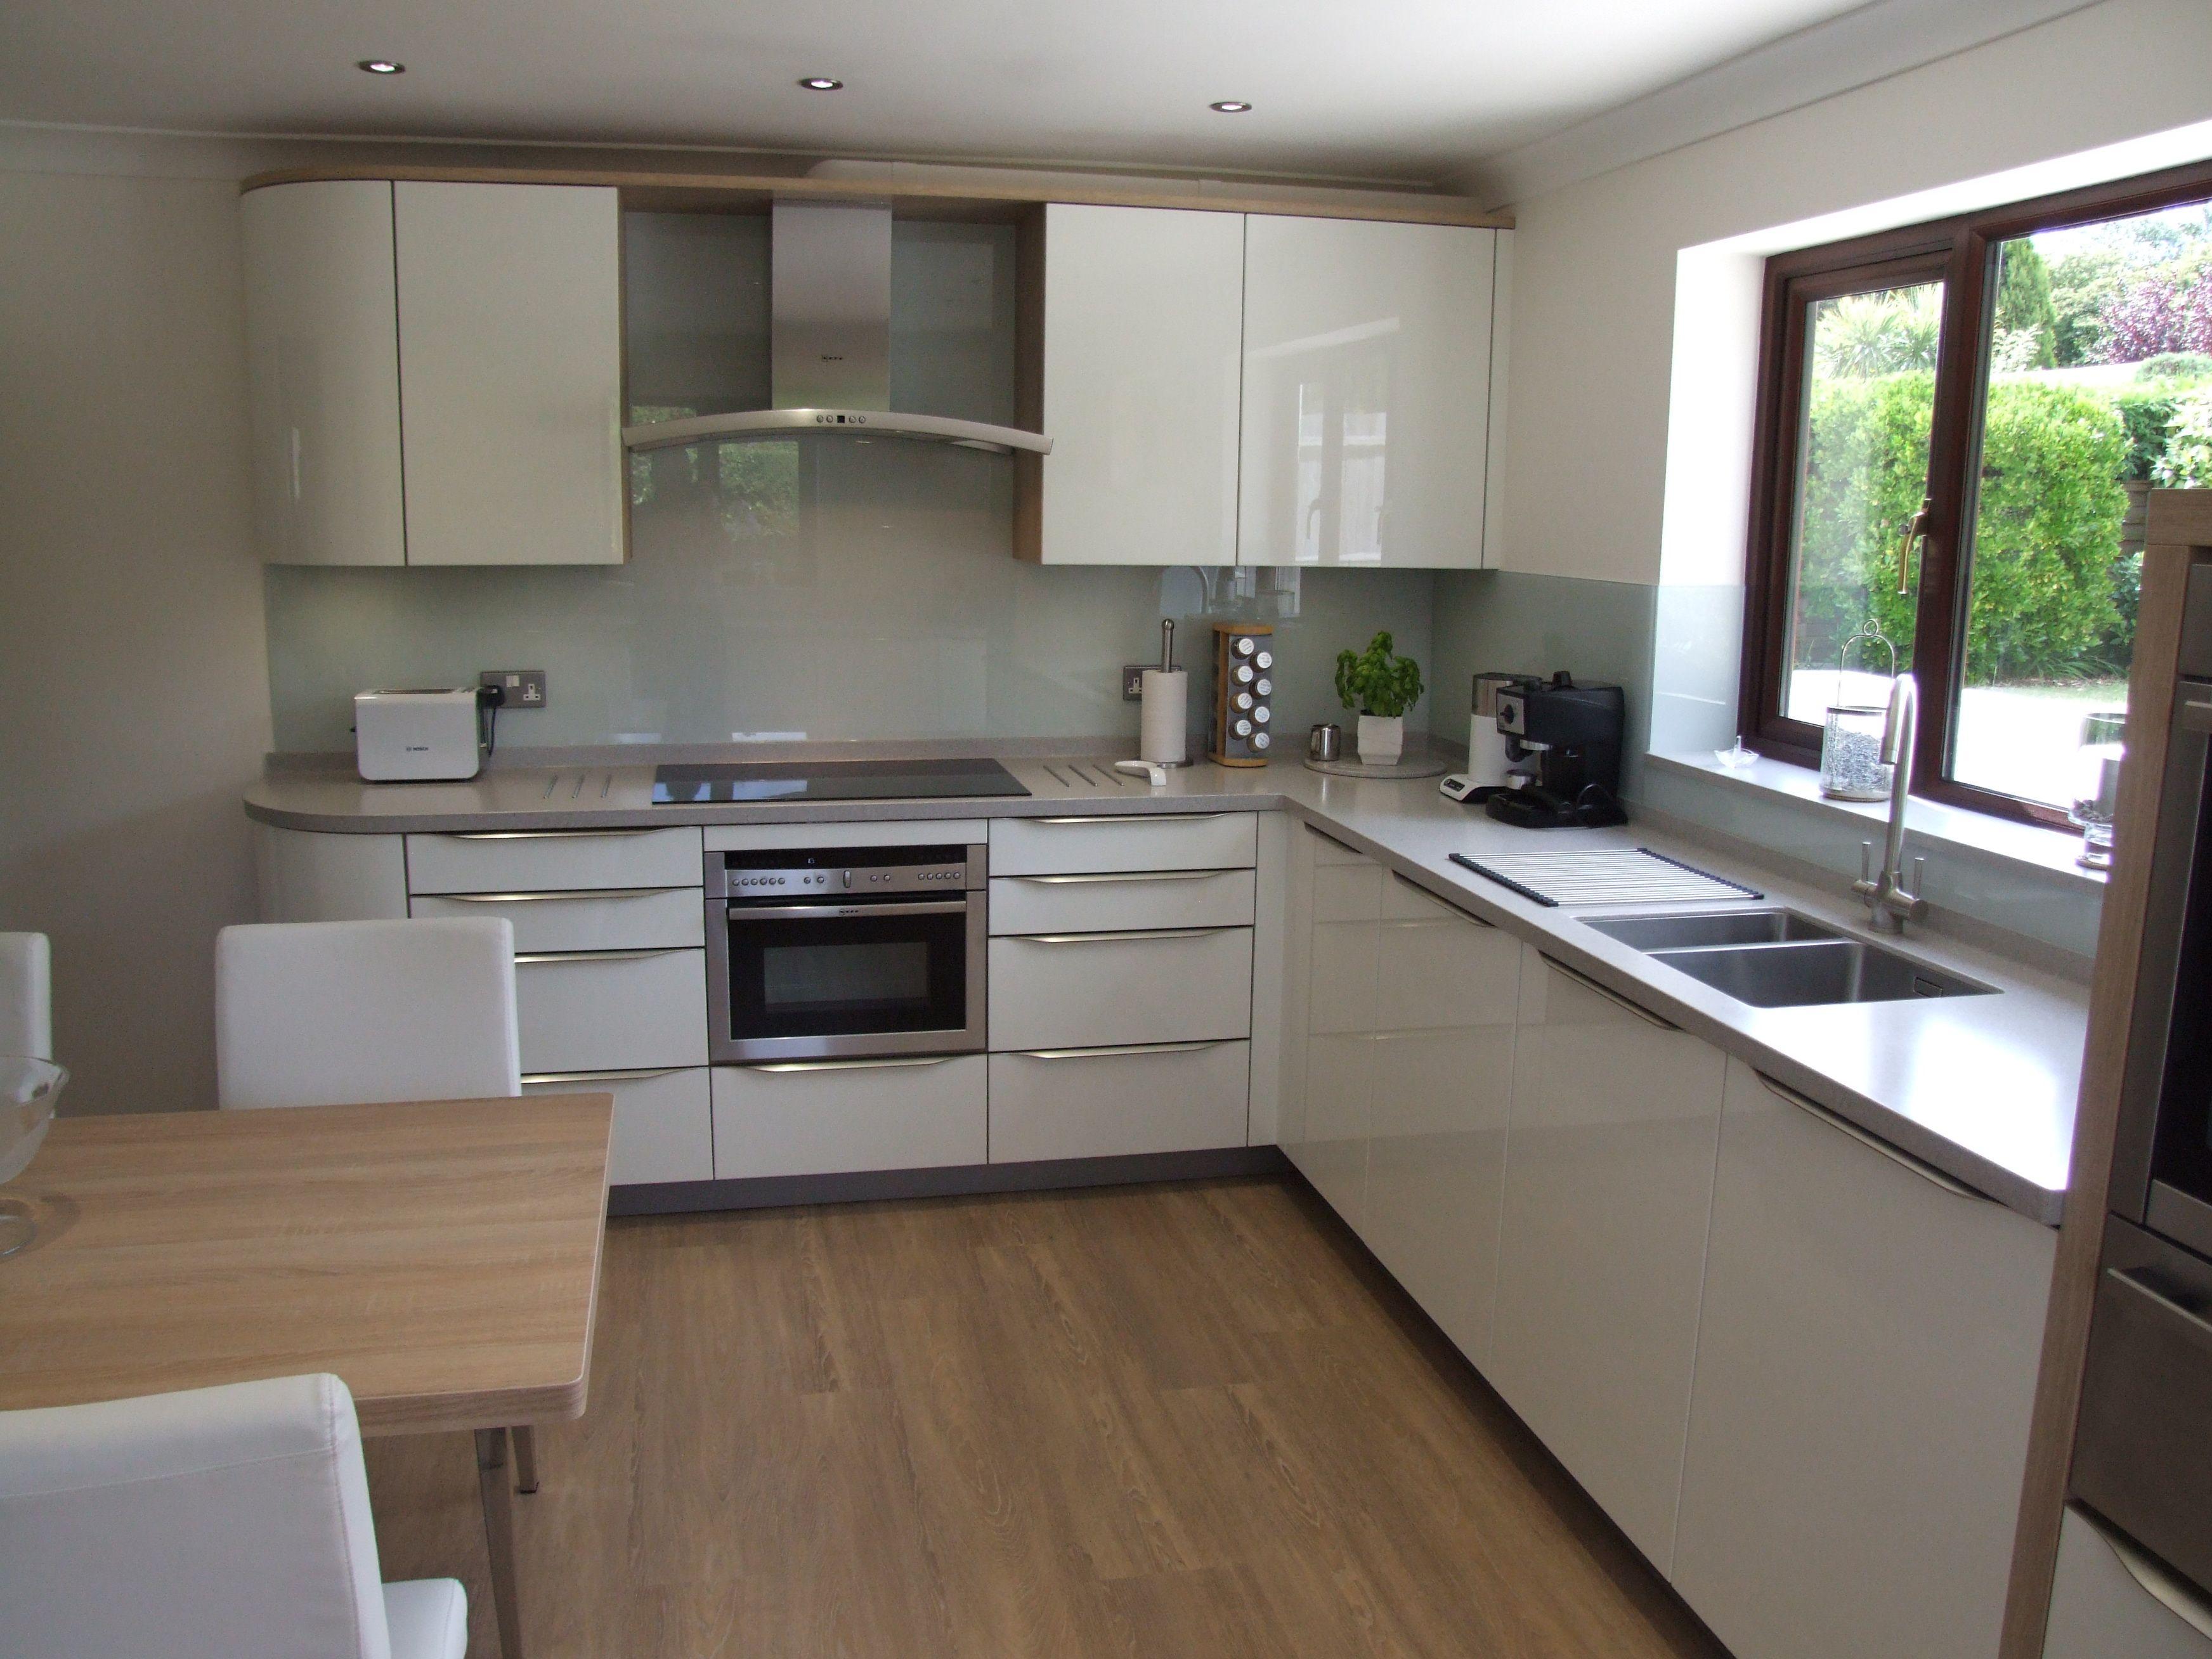 White gloss kitchen with warm oak framework matching for Warm kitchen flooring